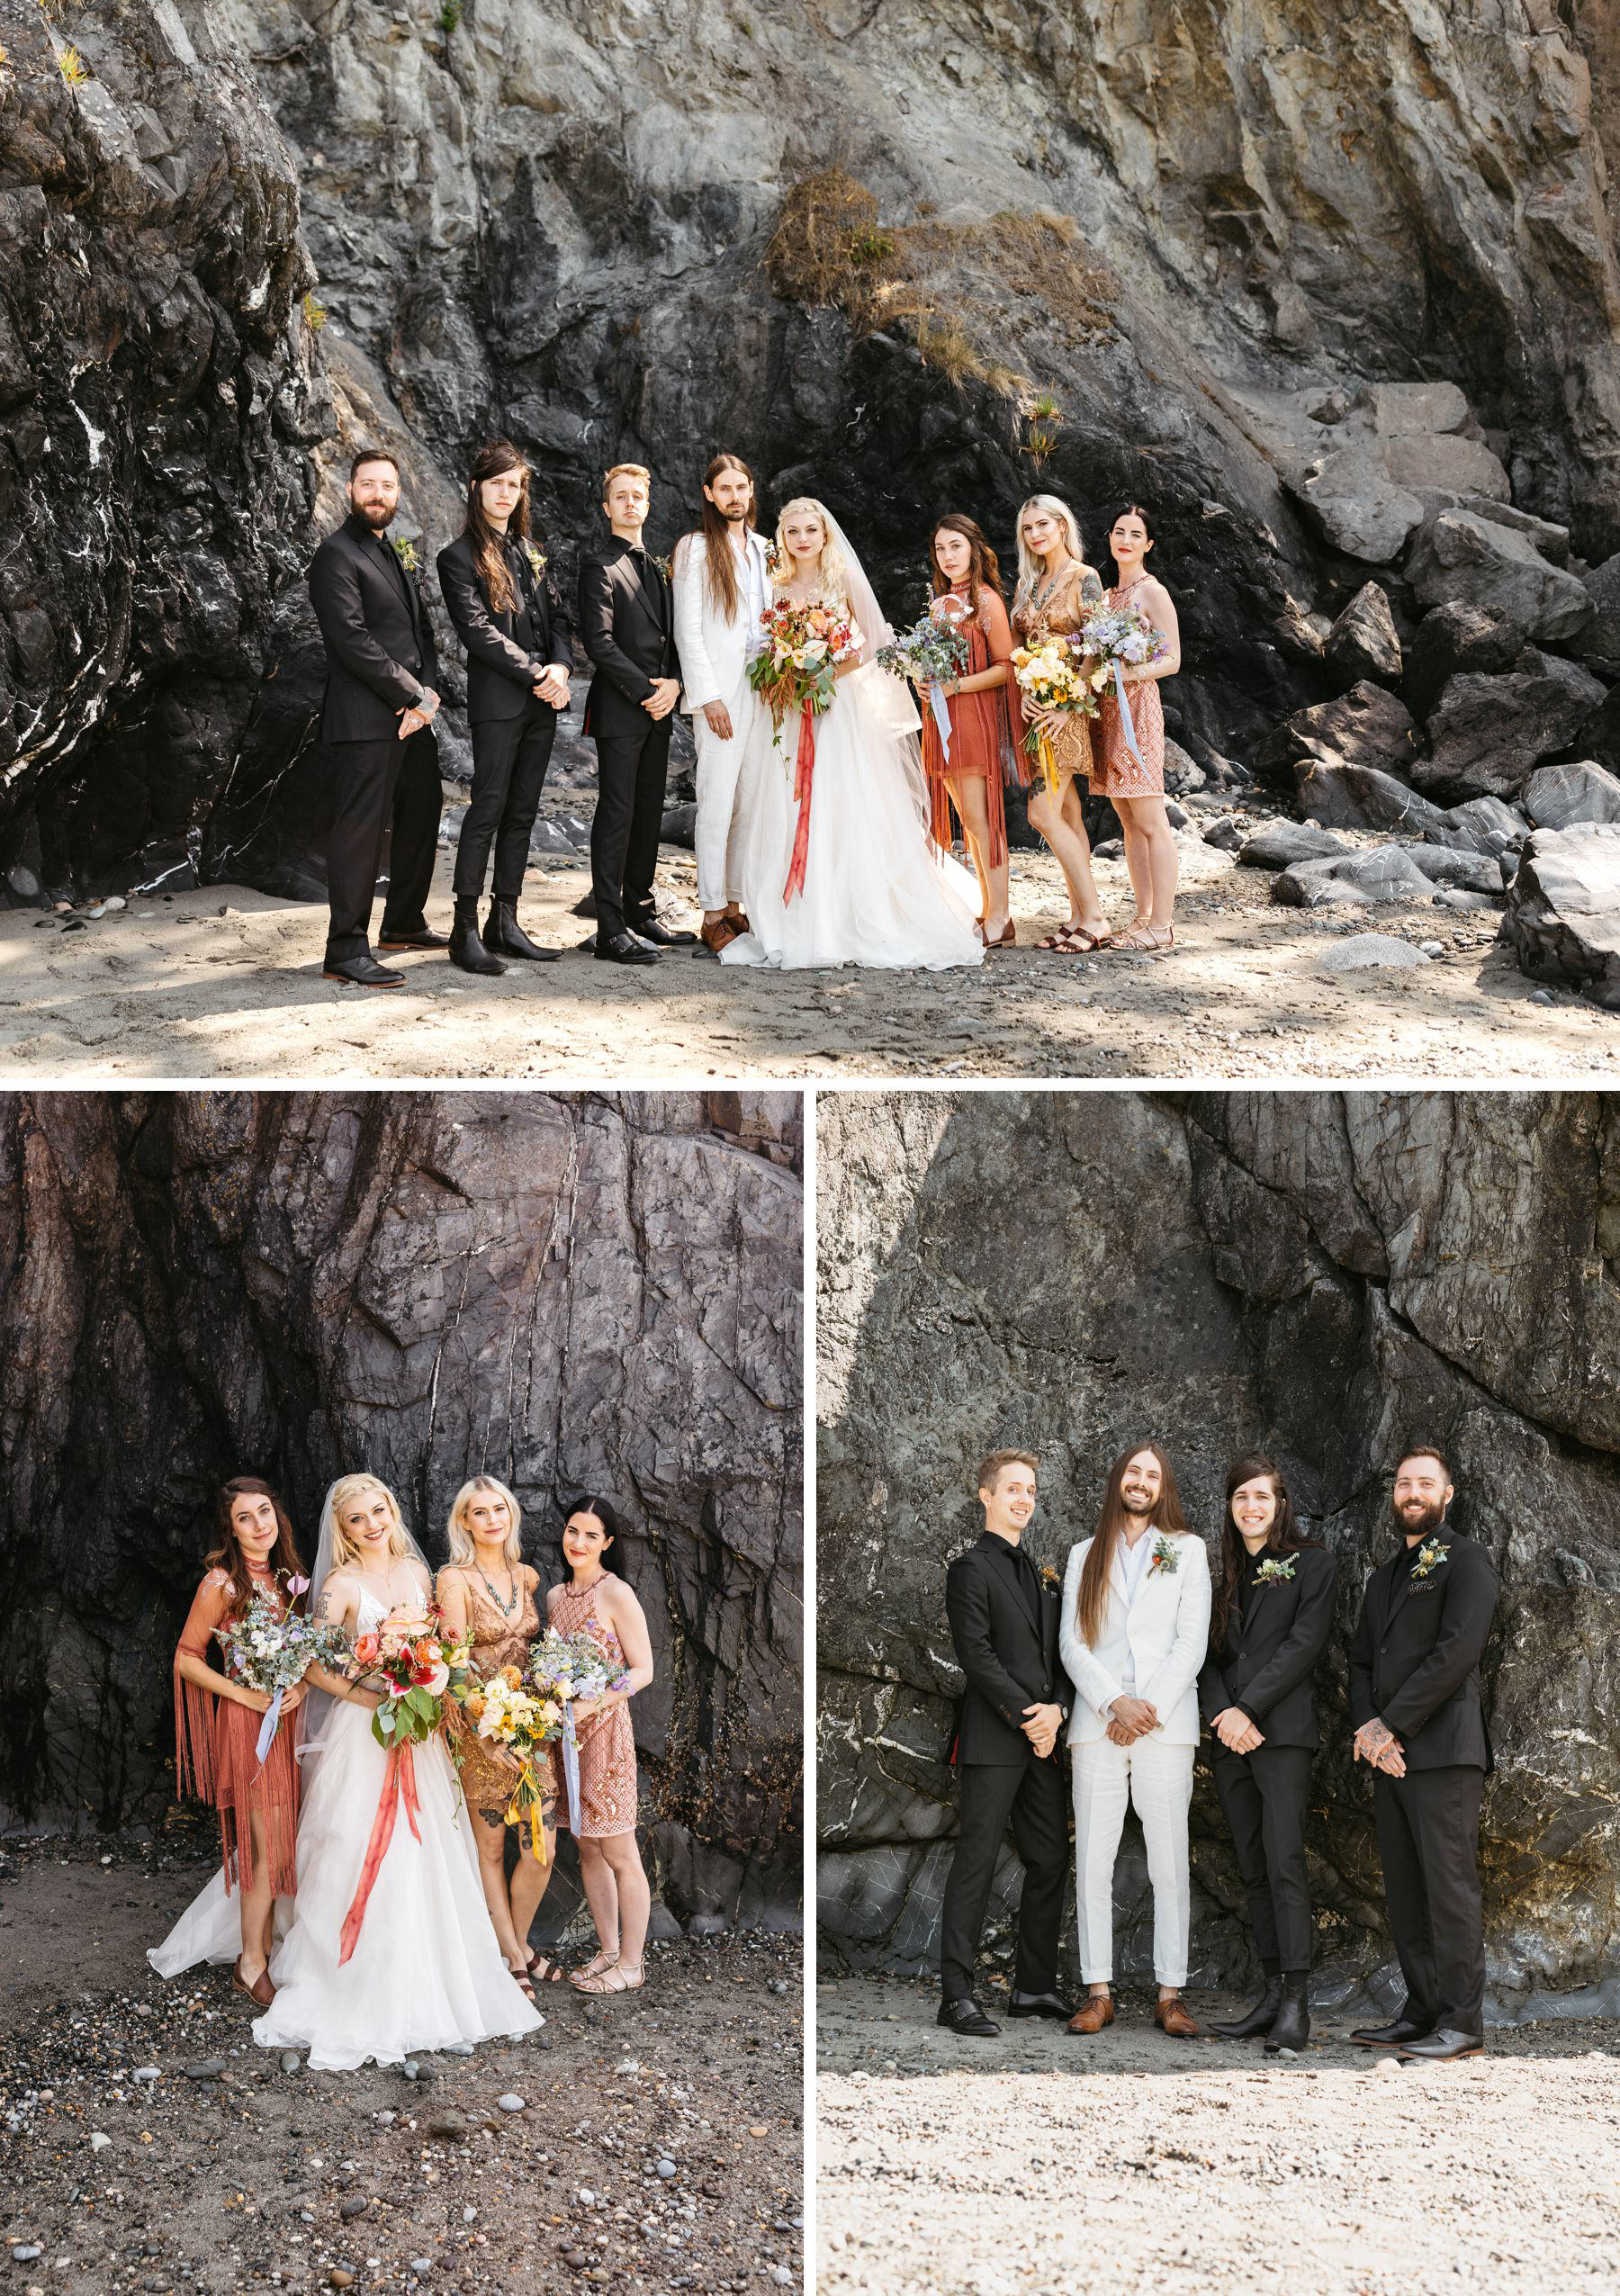 deception pass wedding on beach